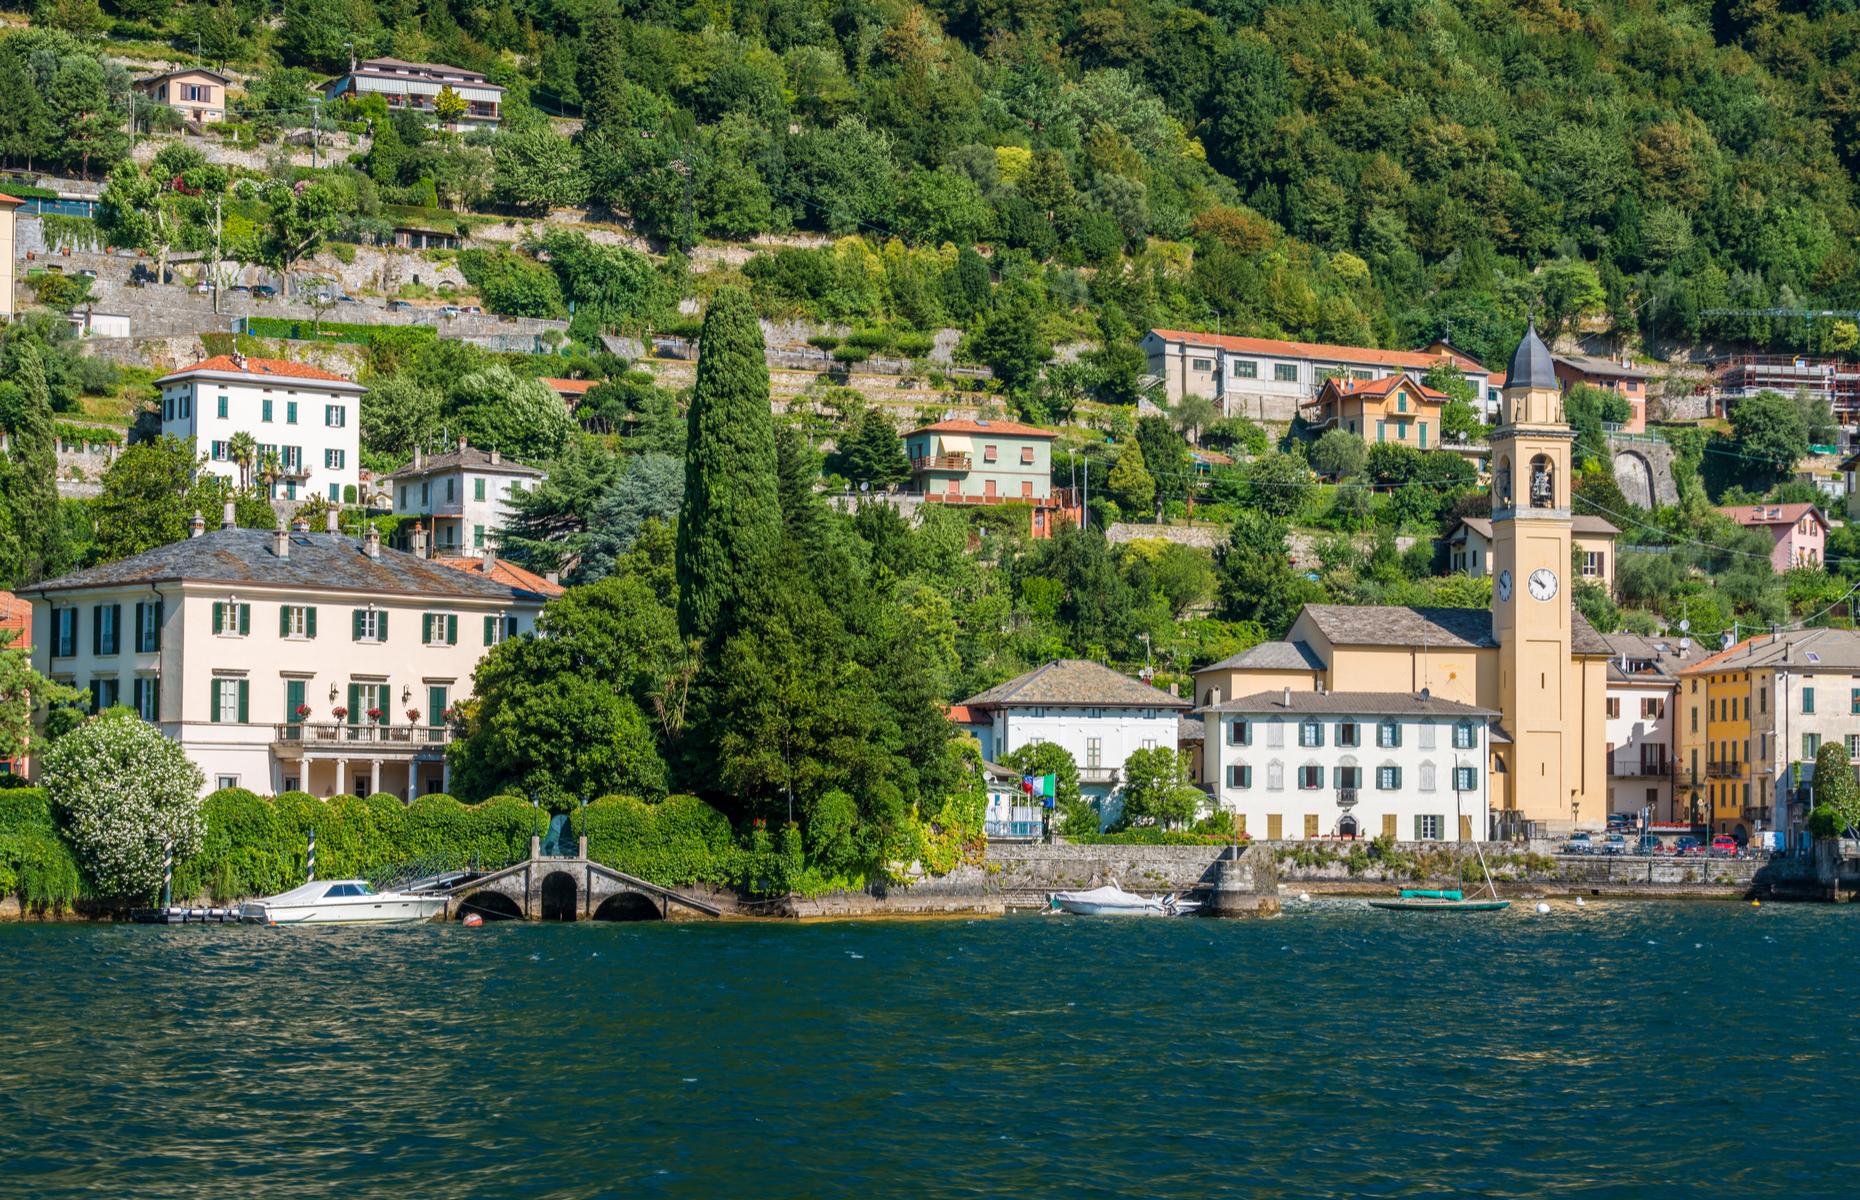 Villa Oleandra on Lake Como. Image: Shutterstock